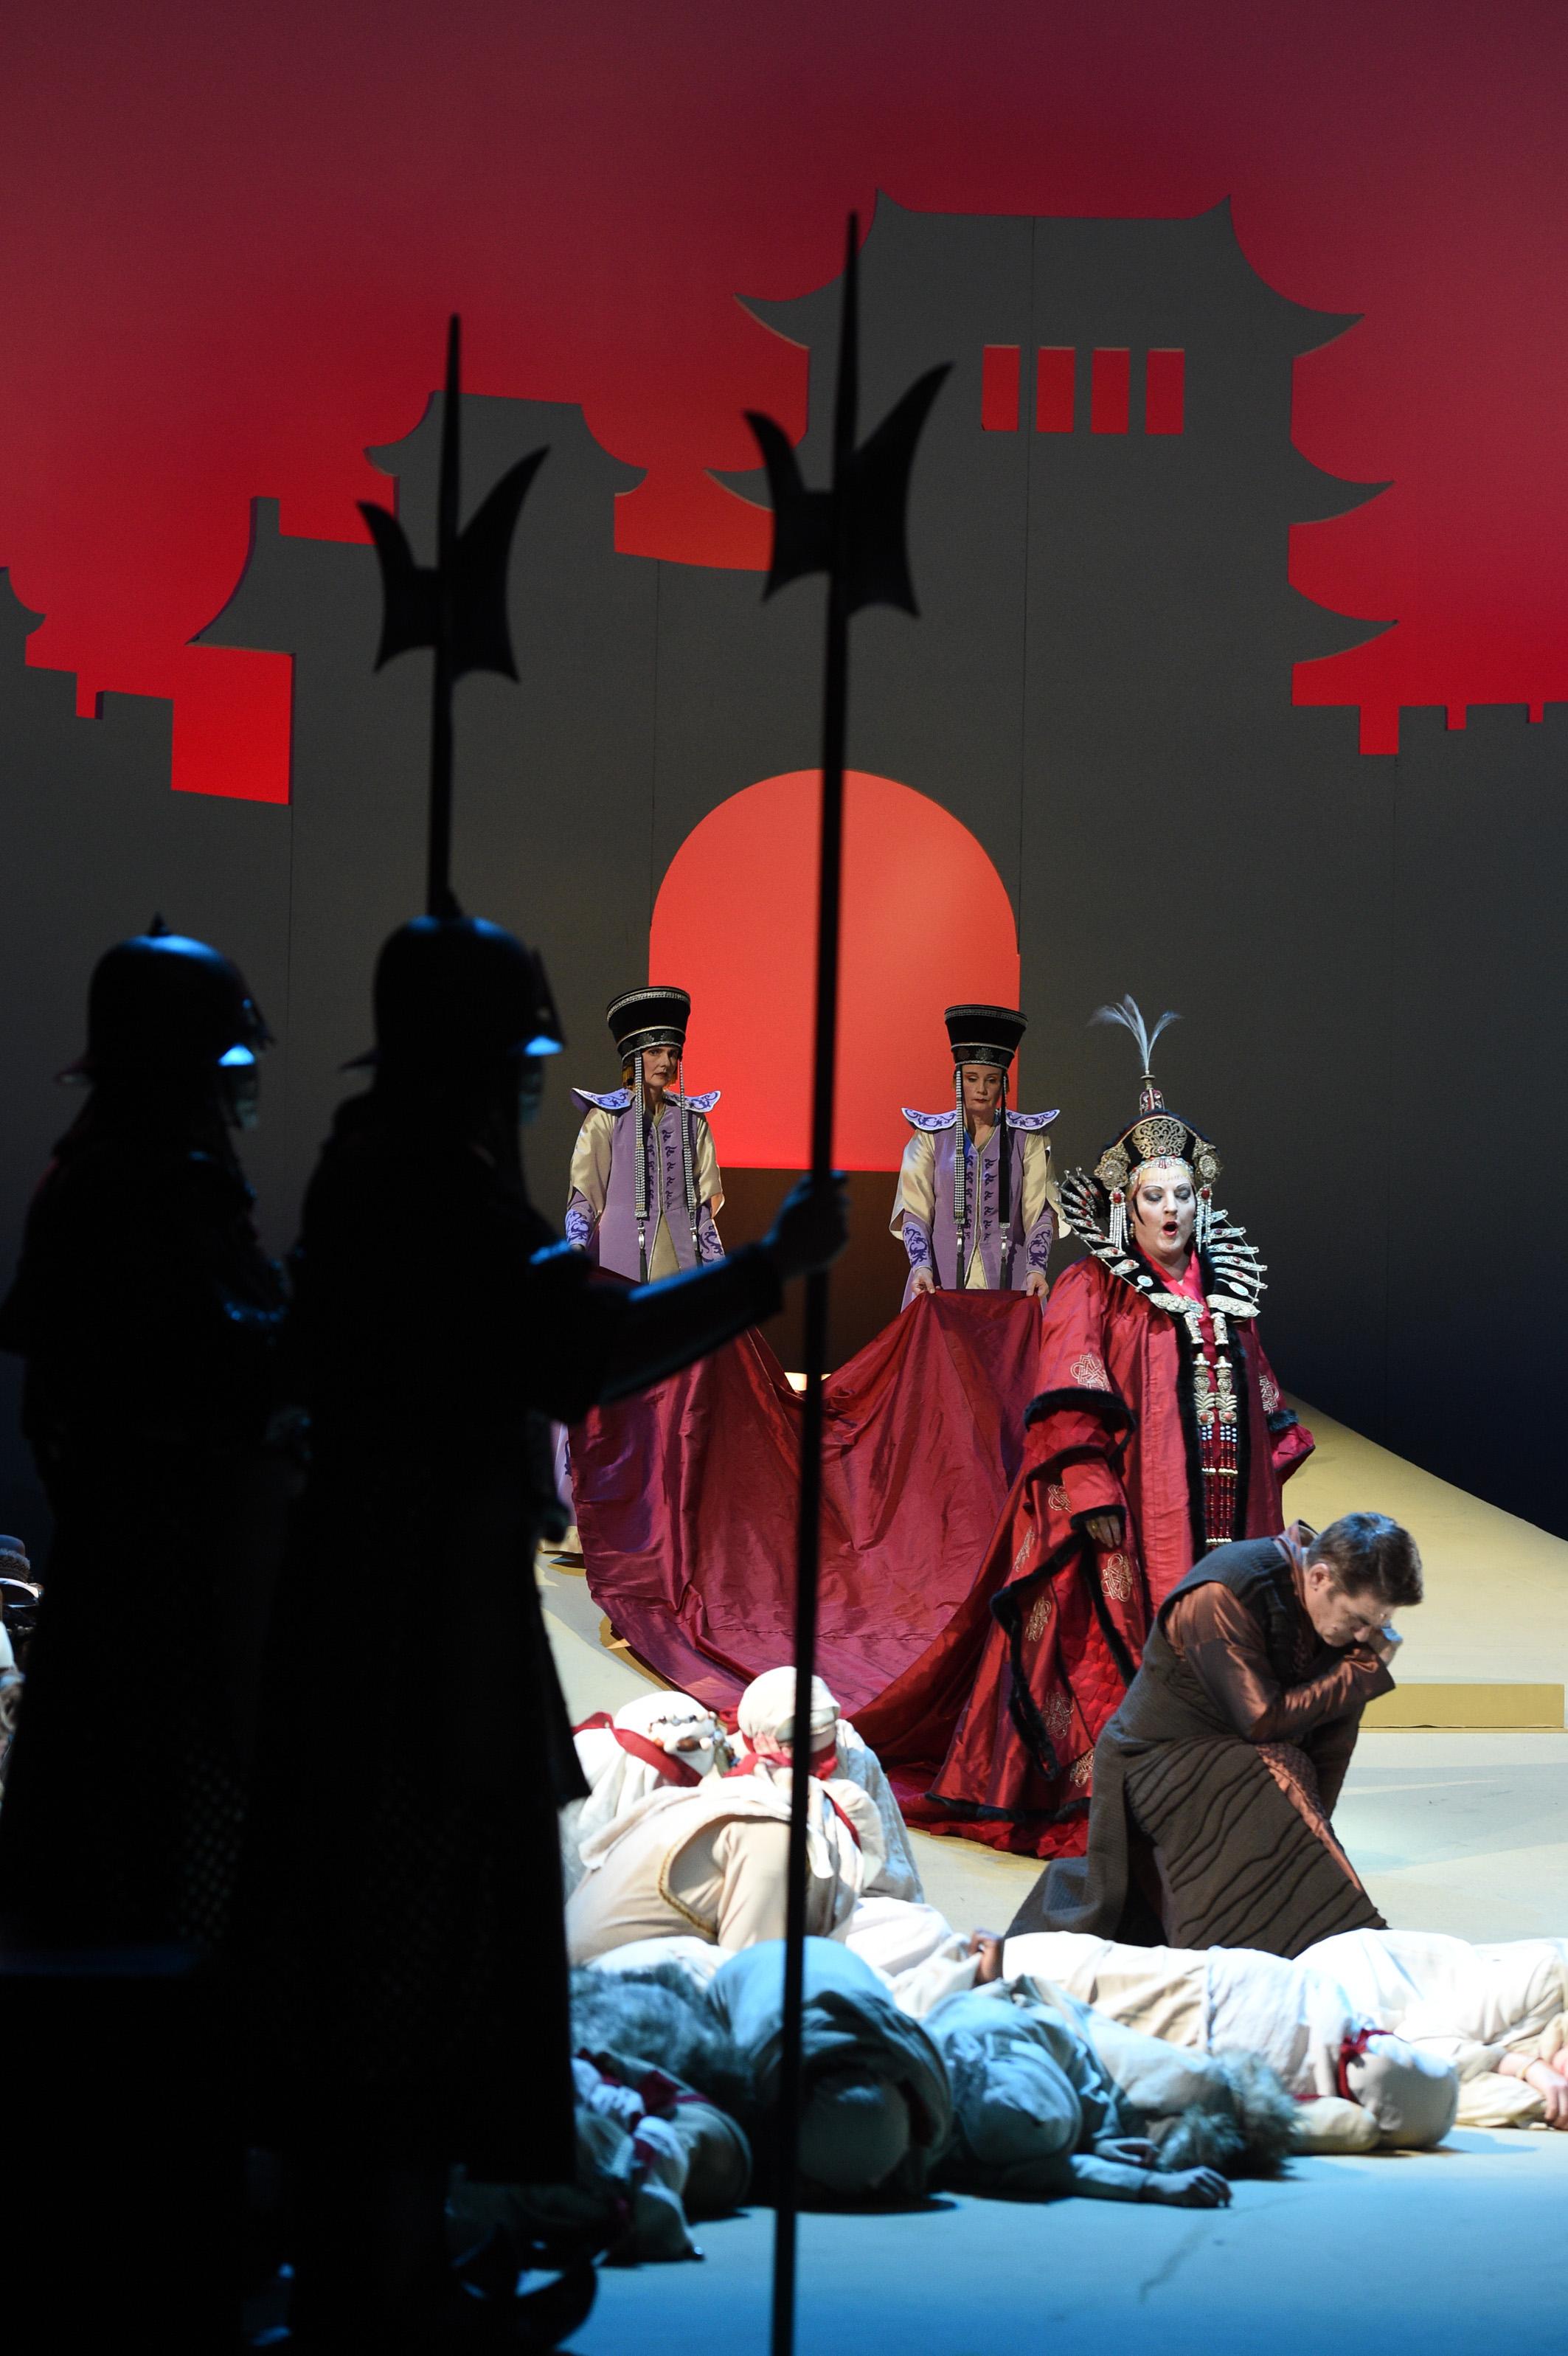 Premiere am 5. Dezember im Theater Duisburg (Foto: Hans Jörg Michel)